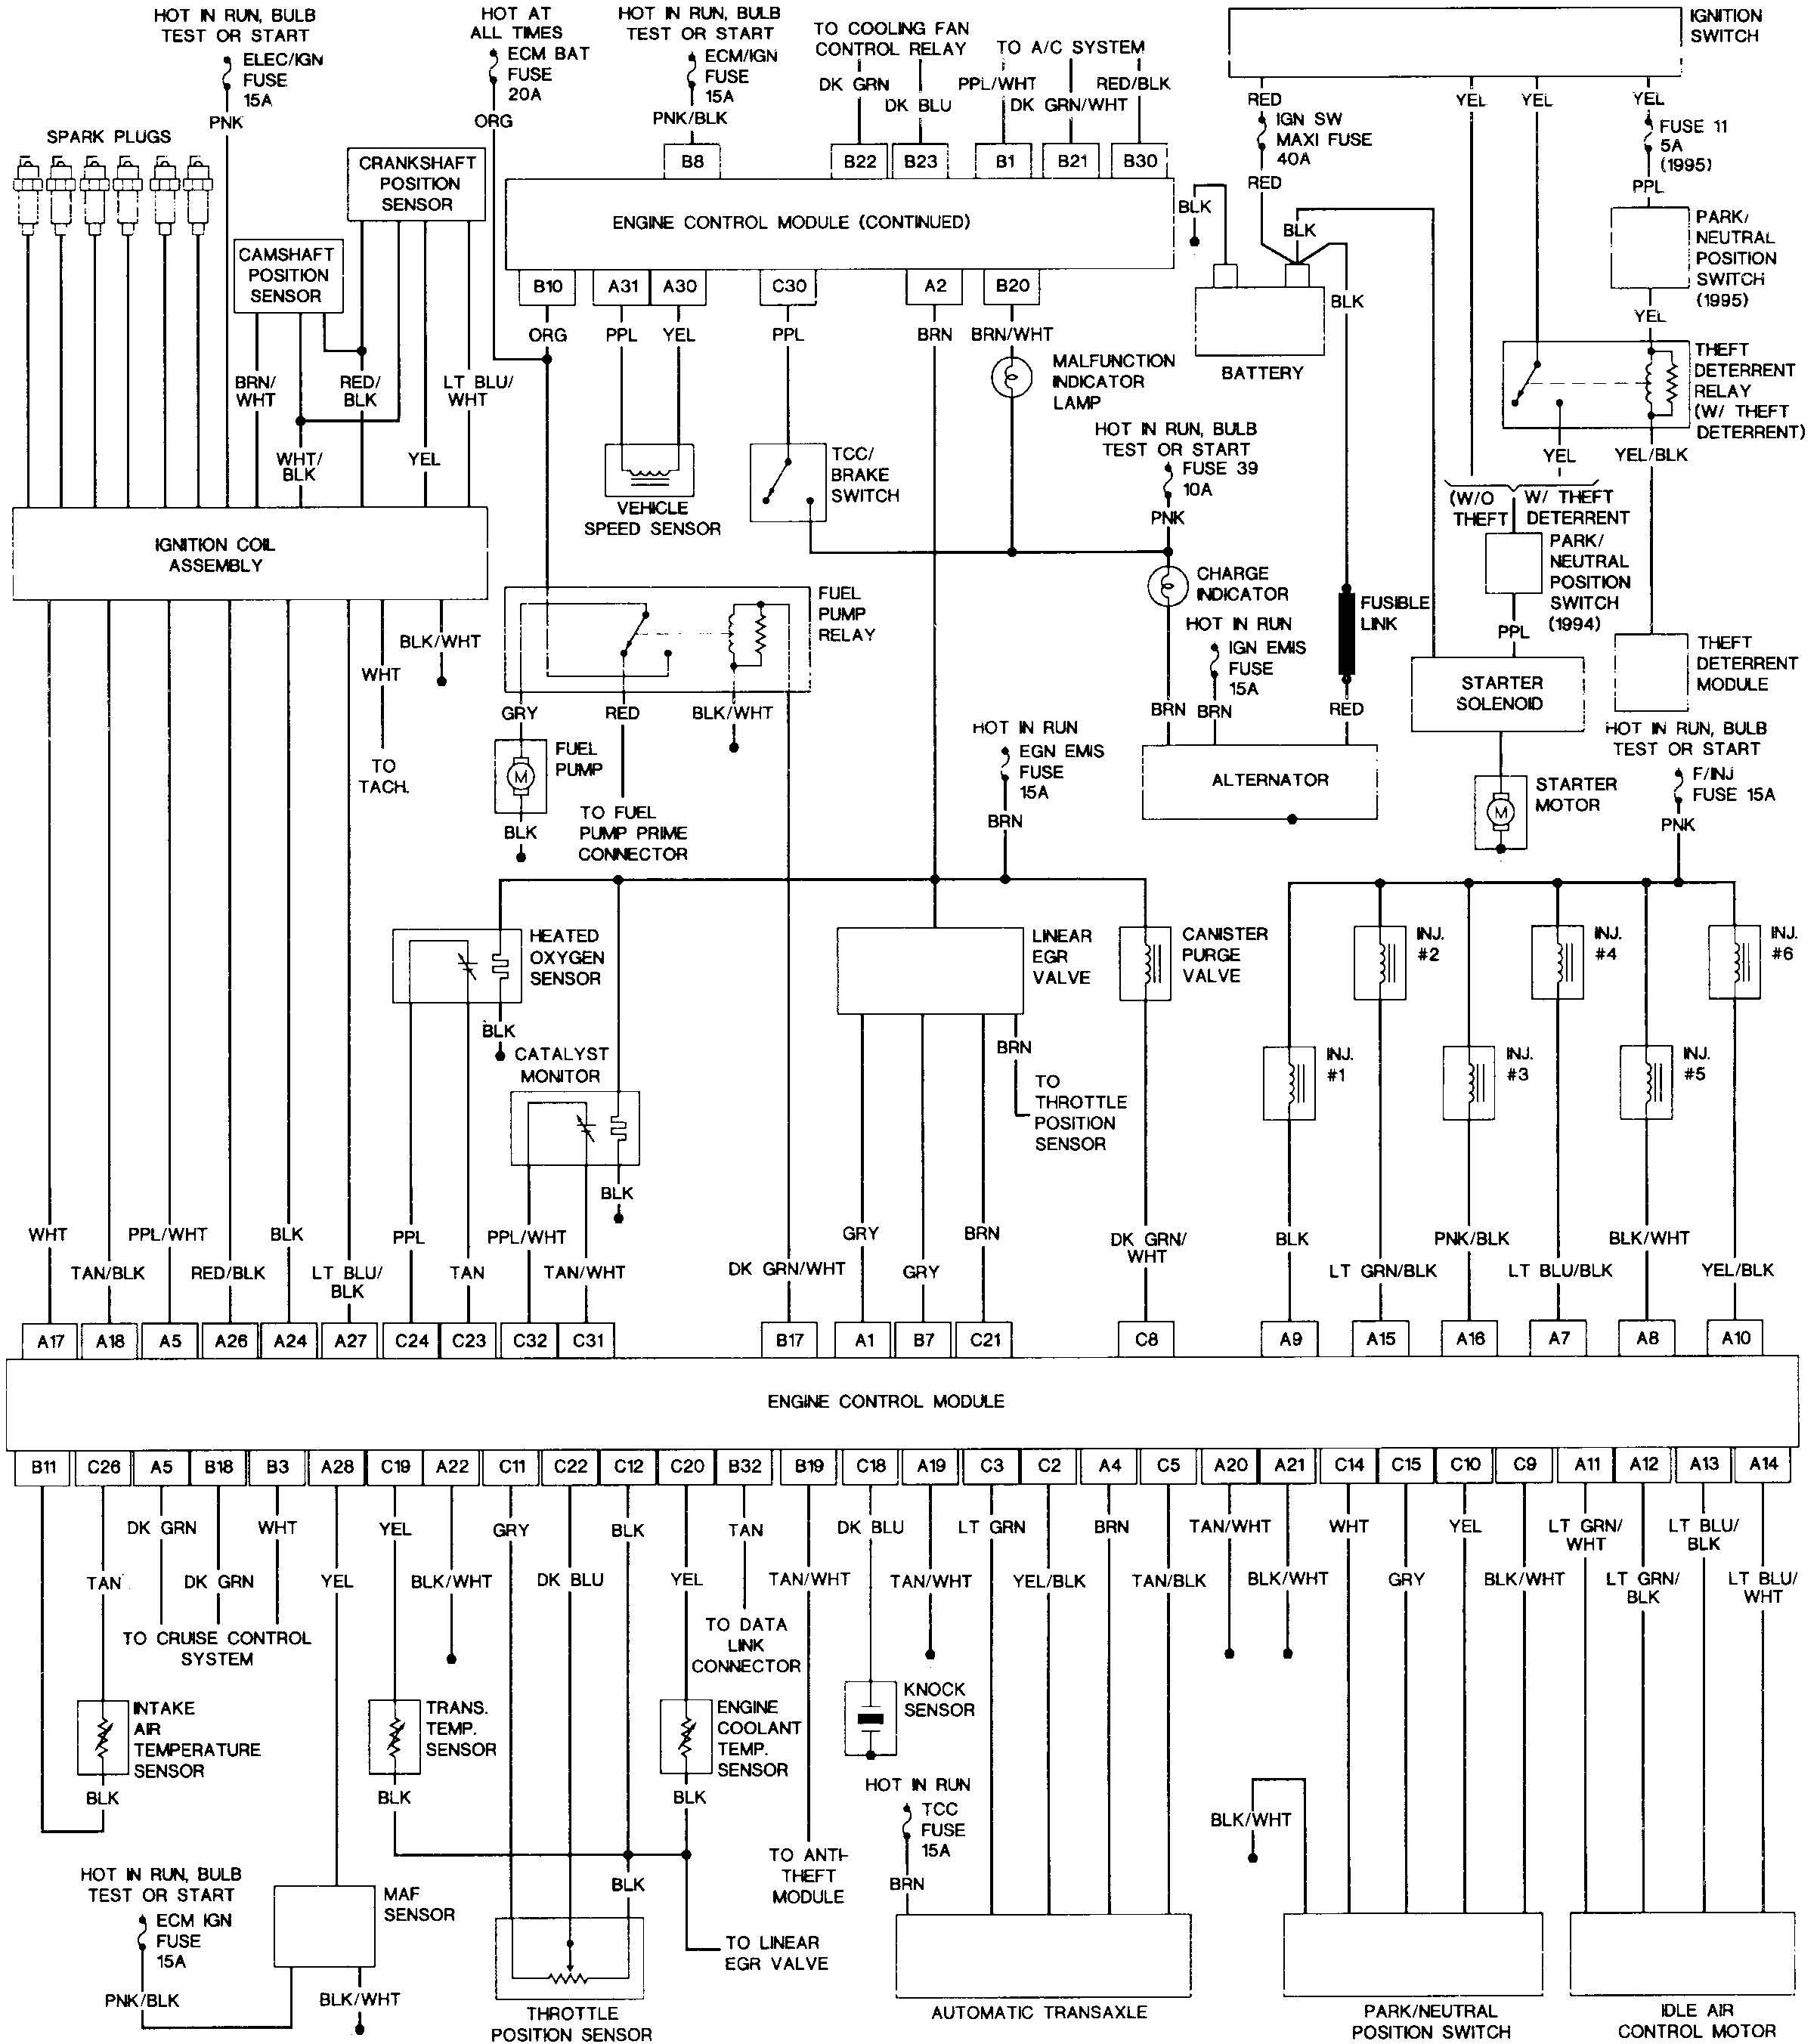 2001 jeep cherokee wiring diagram moreover grand yb 4902  cherokee radio wiring harness download diagram  yb 4902  cherokee radio wiring harness